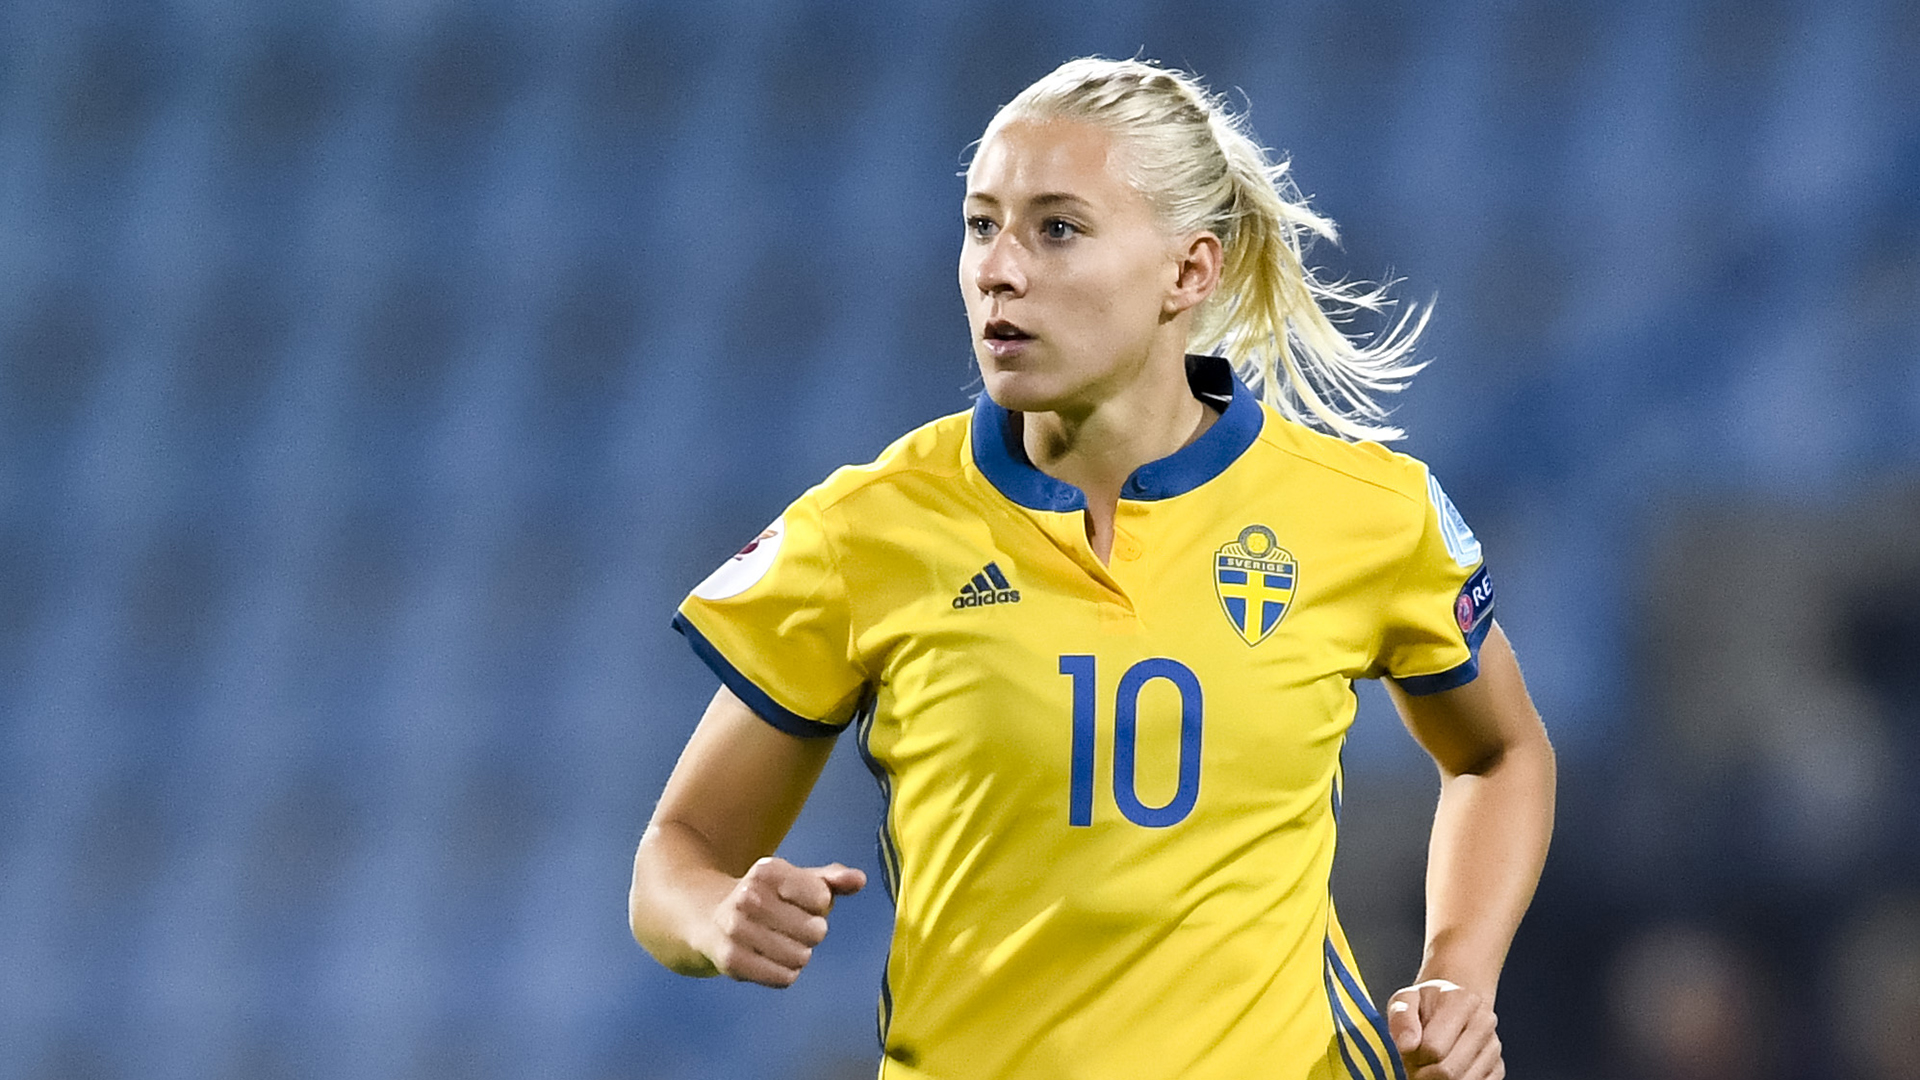 Fotbolls-EM 2017, Dag 10, Sverige – Italien